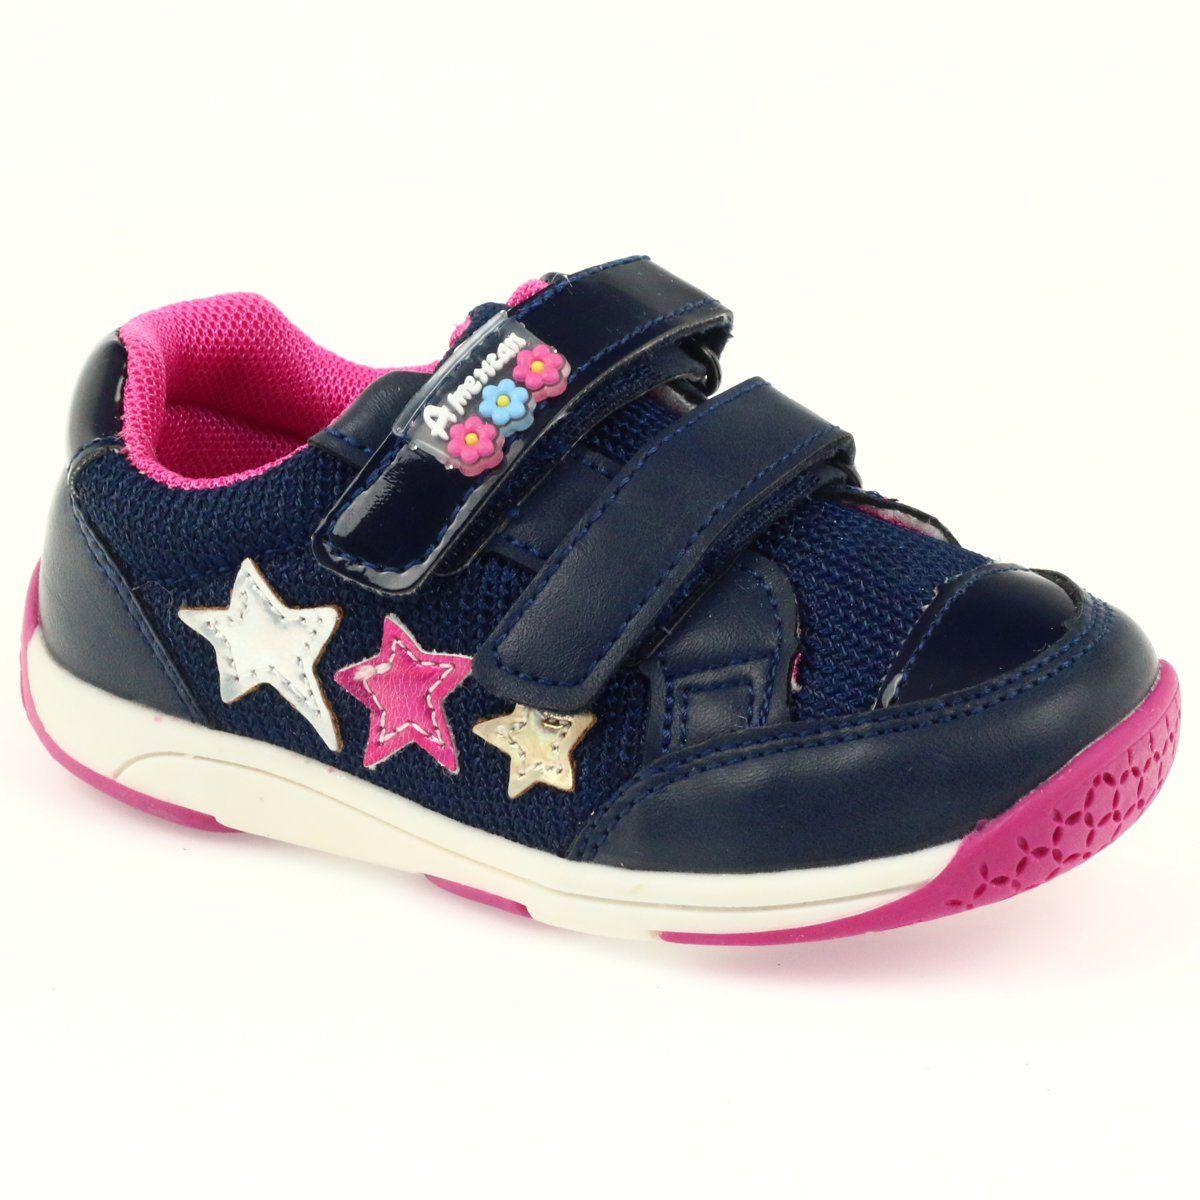 American Club American Adi Sportowe Buty Dzieciece 6759 Granatowe Baby Shoes Kids Shoes Girls Shoes